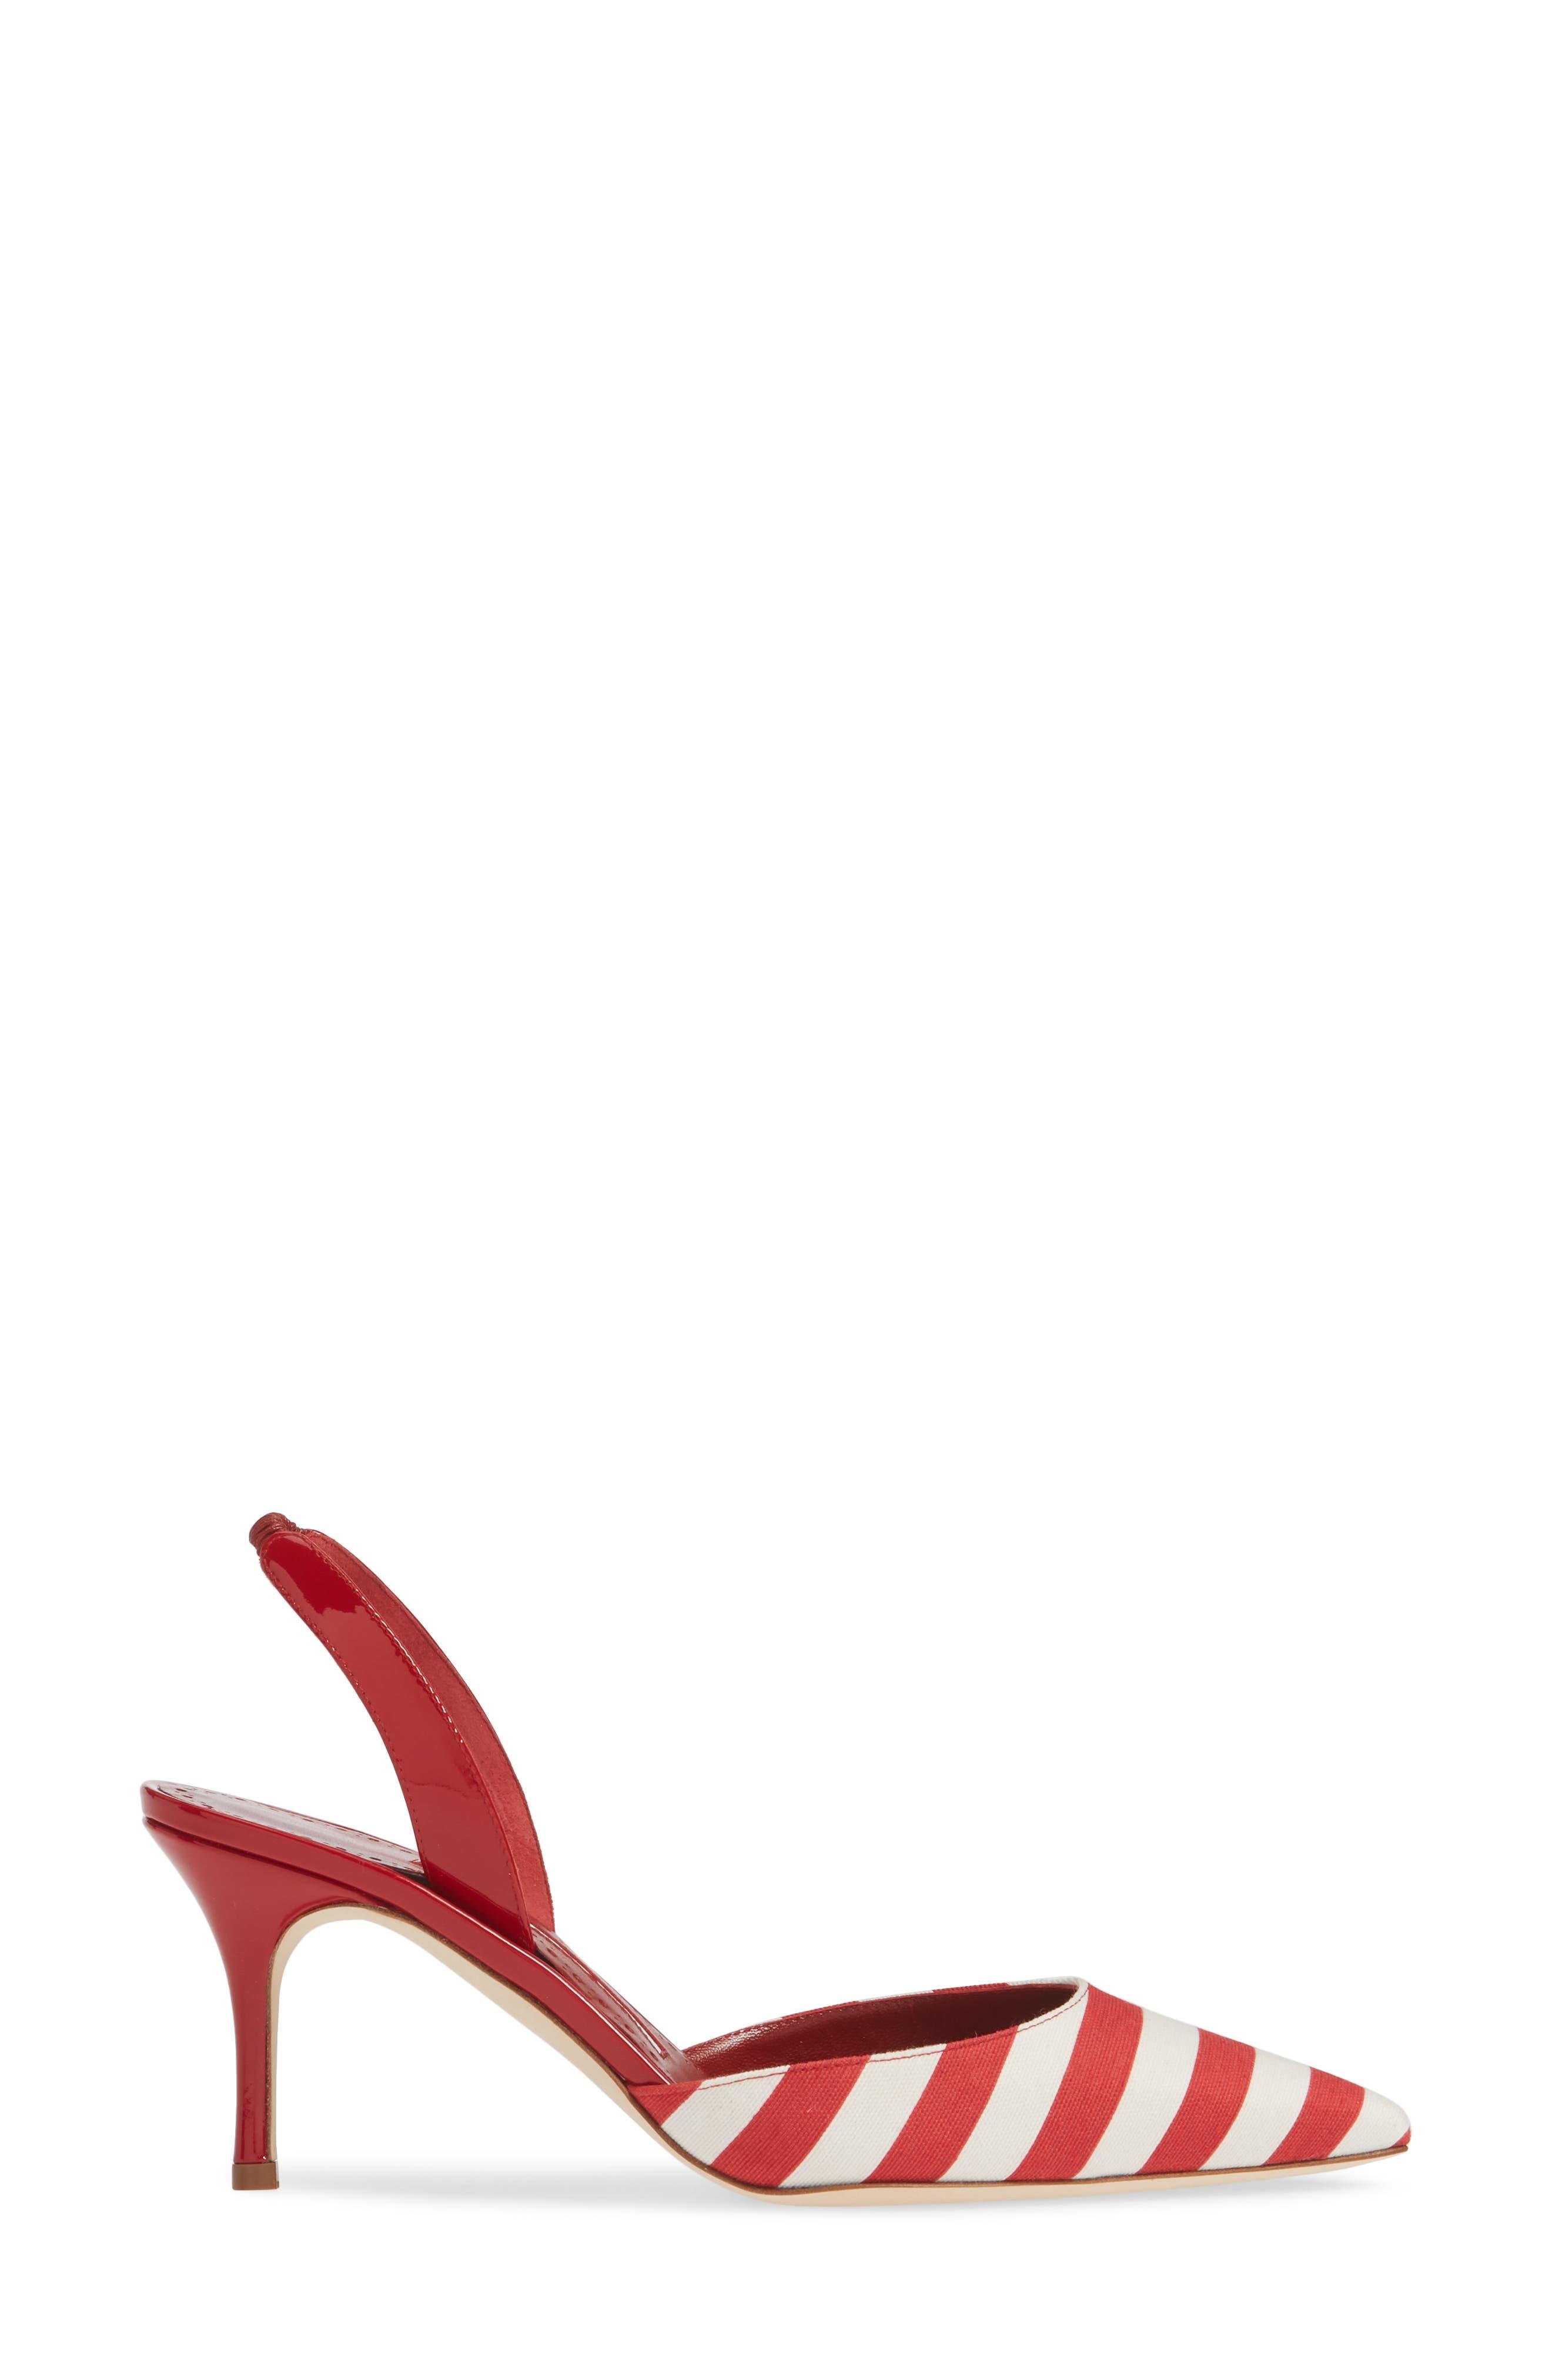 'Carolyne' Pointy Toe Slingback Pump,                             Alternate thumbnail 3, color,                             RED/ WHITE STRIPE